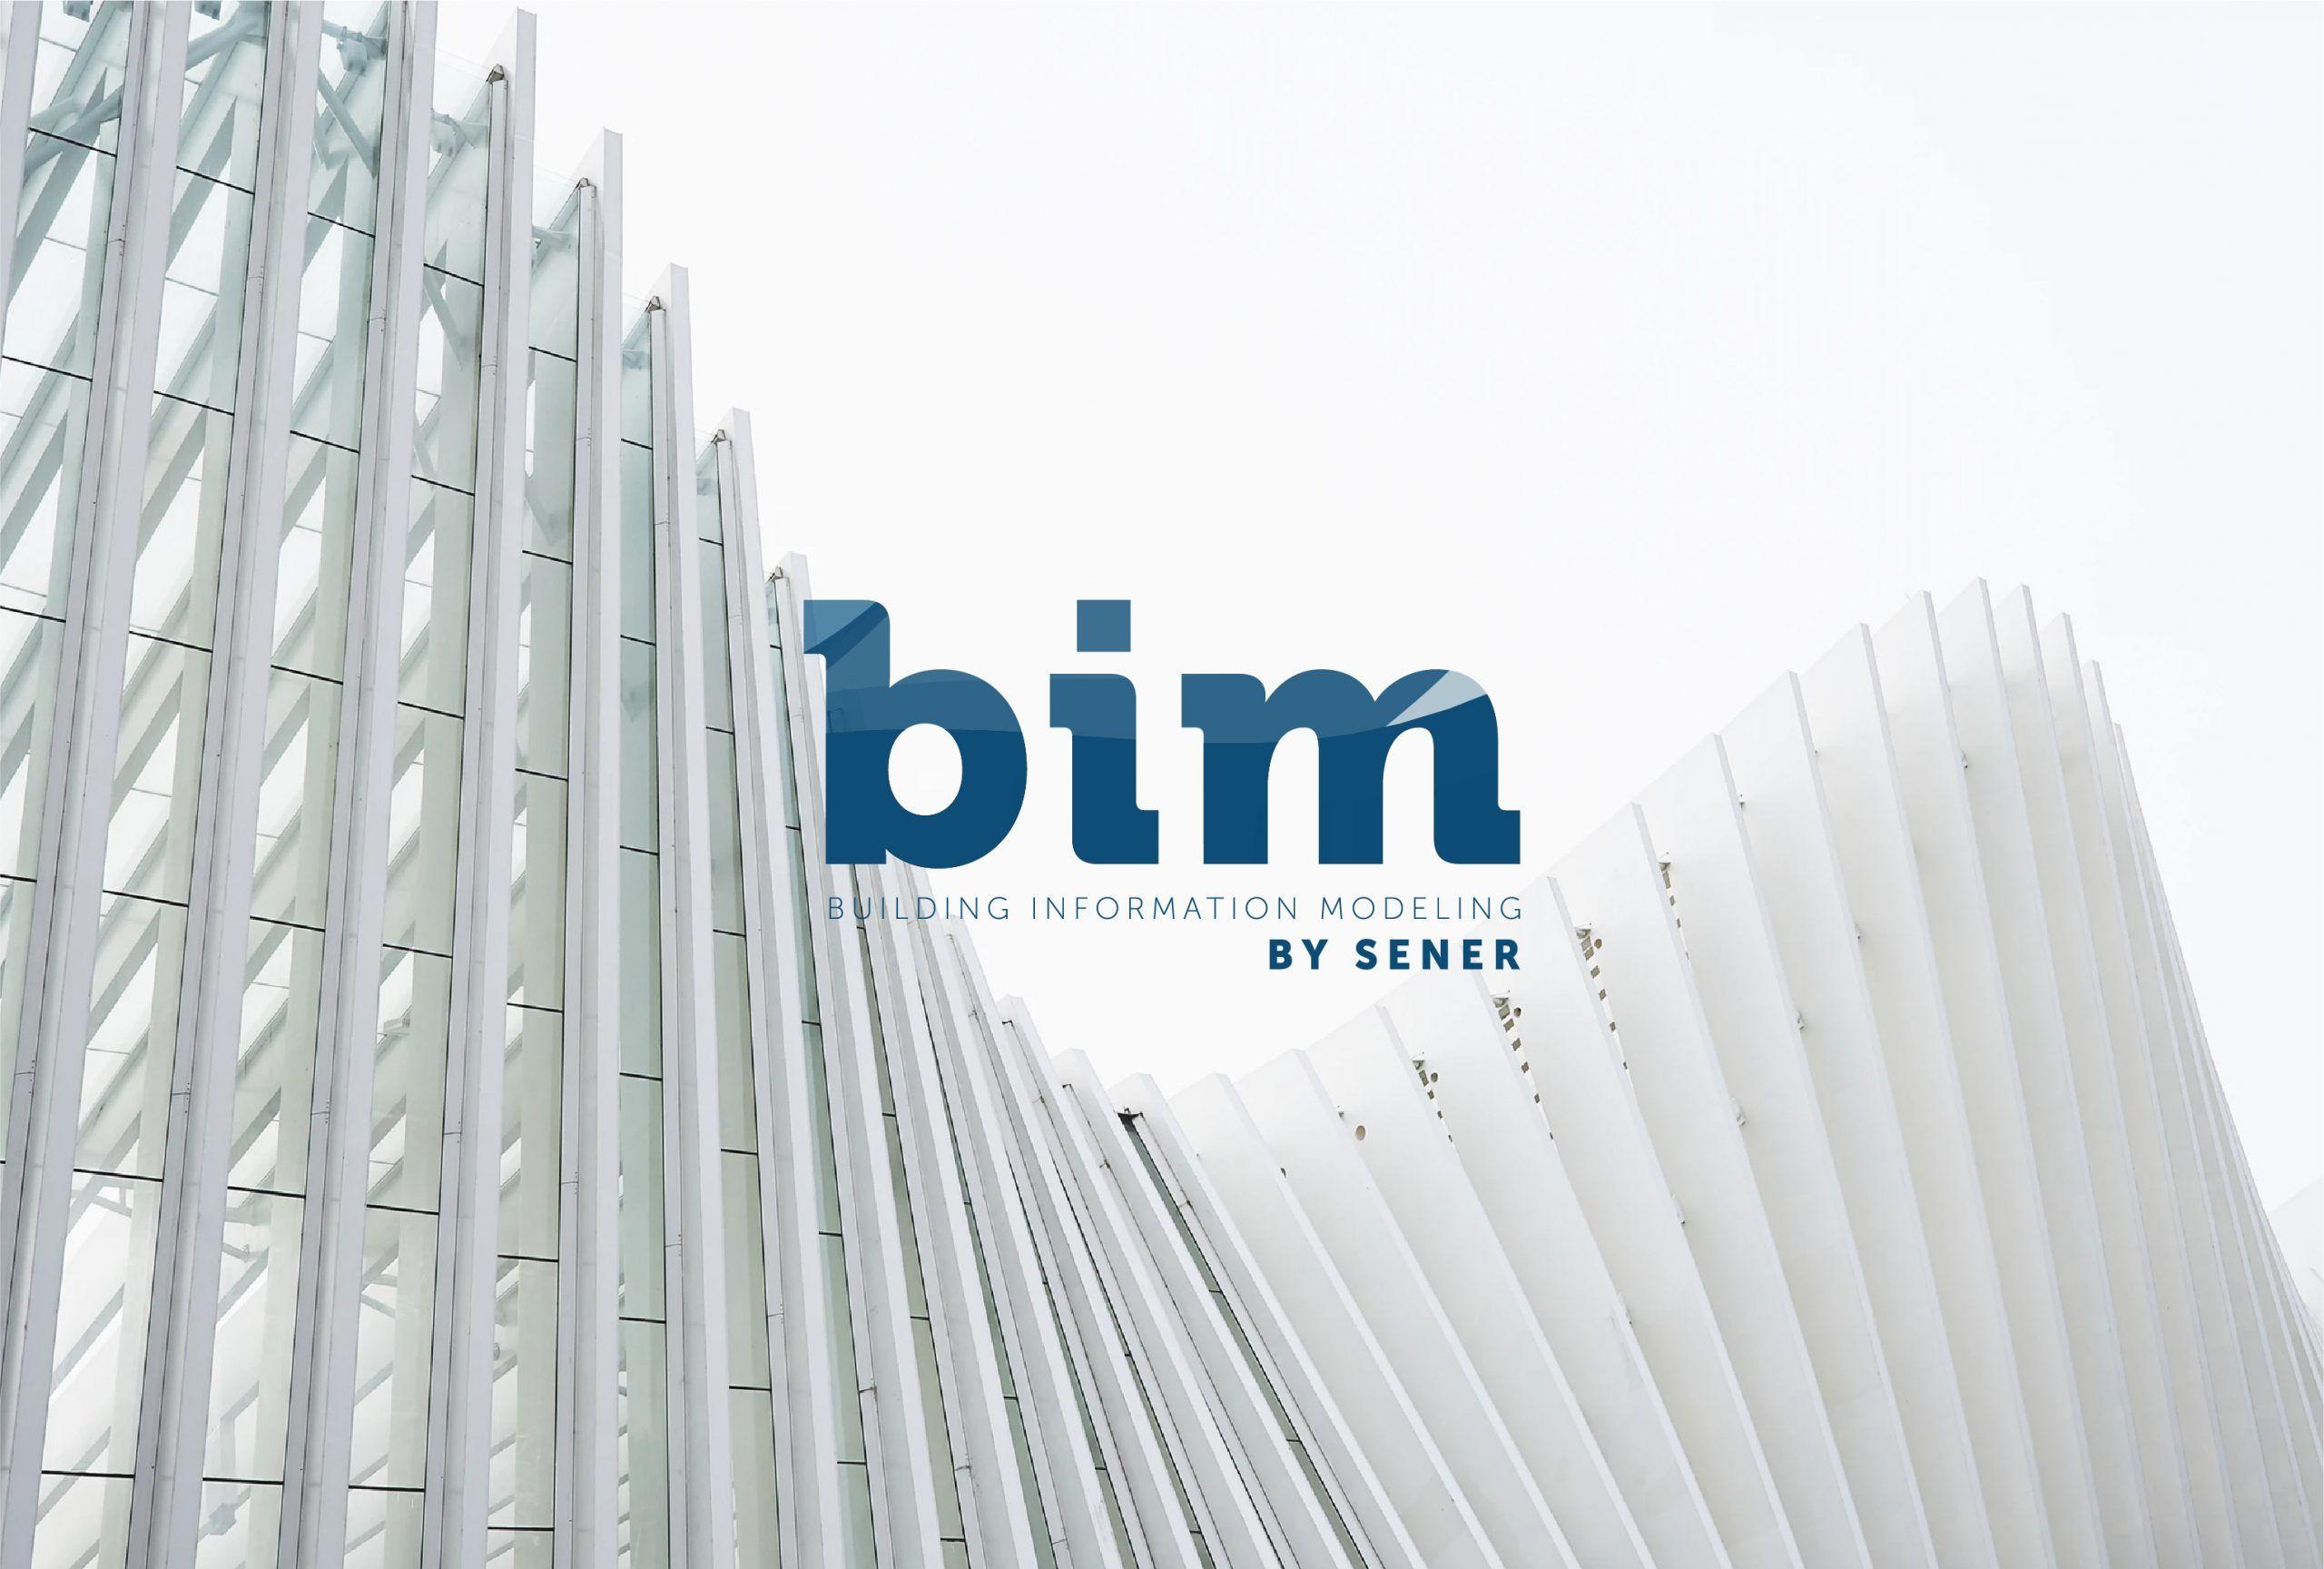 diseño imagen corporativa bim